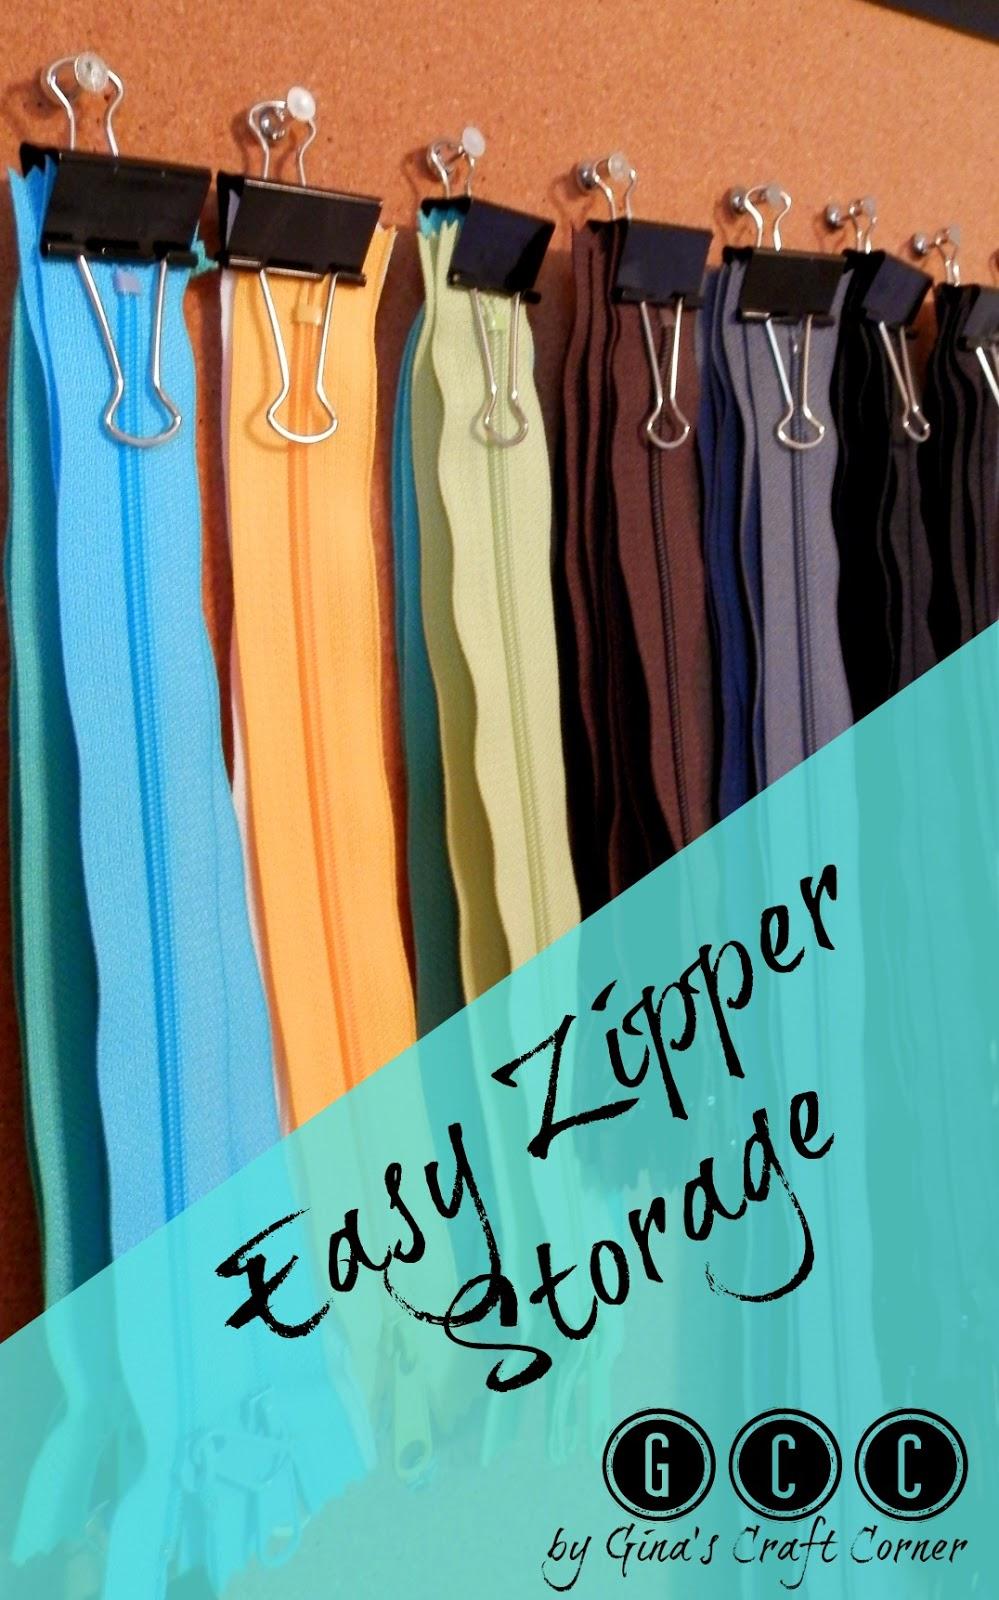 http://3.bp.blogspot.com/-5UZURop2ANk/VJ3vM_Std5I/AAAAAAAAE34/R4nhtxulNgQ/s1600/zipper%2Bstorage.jpg